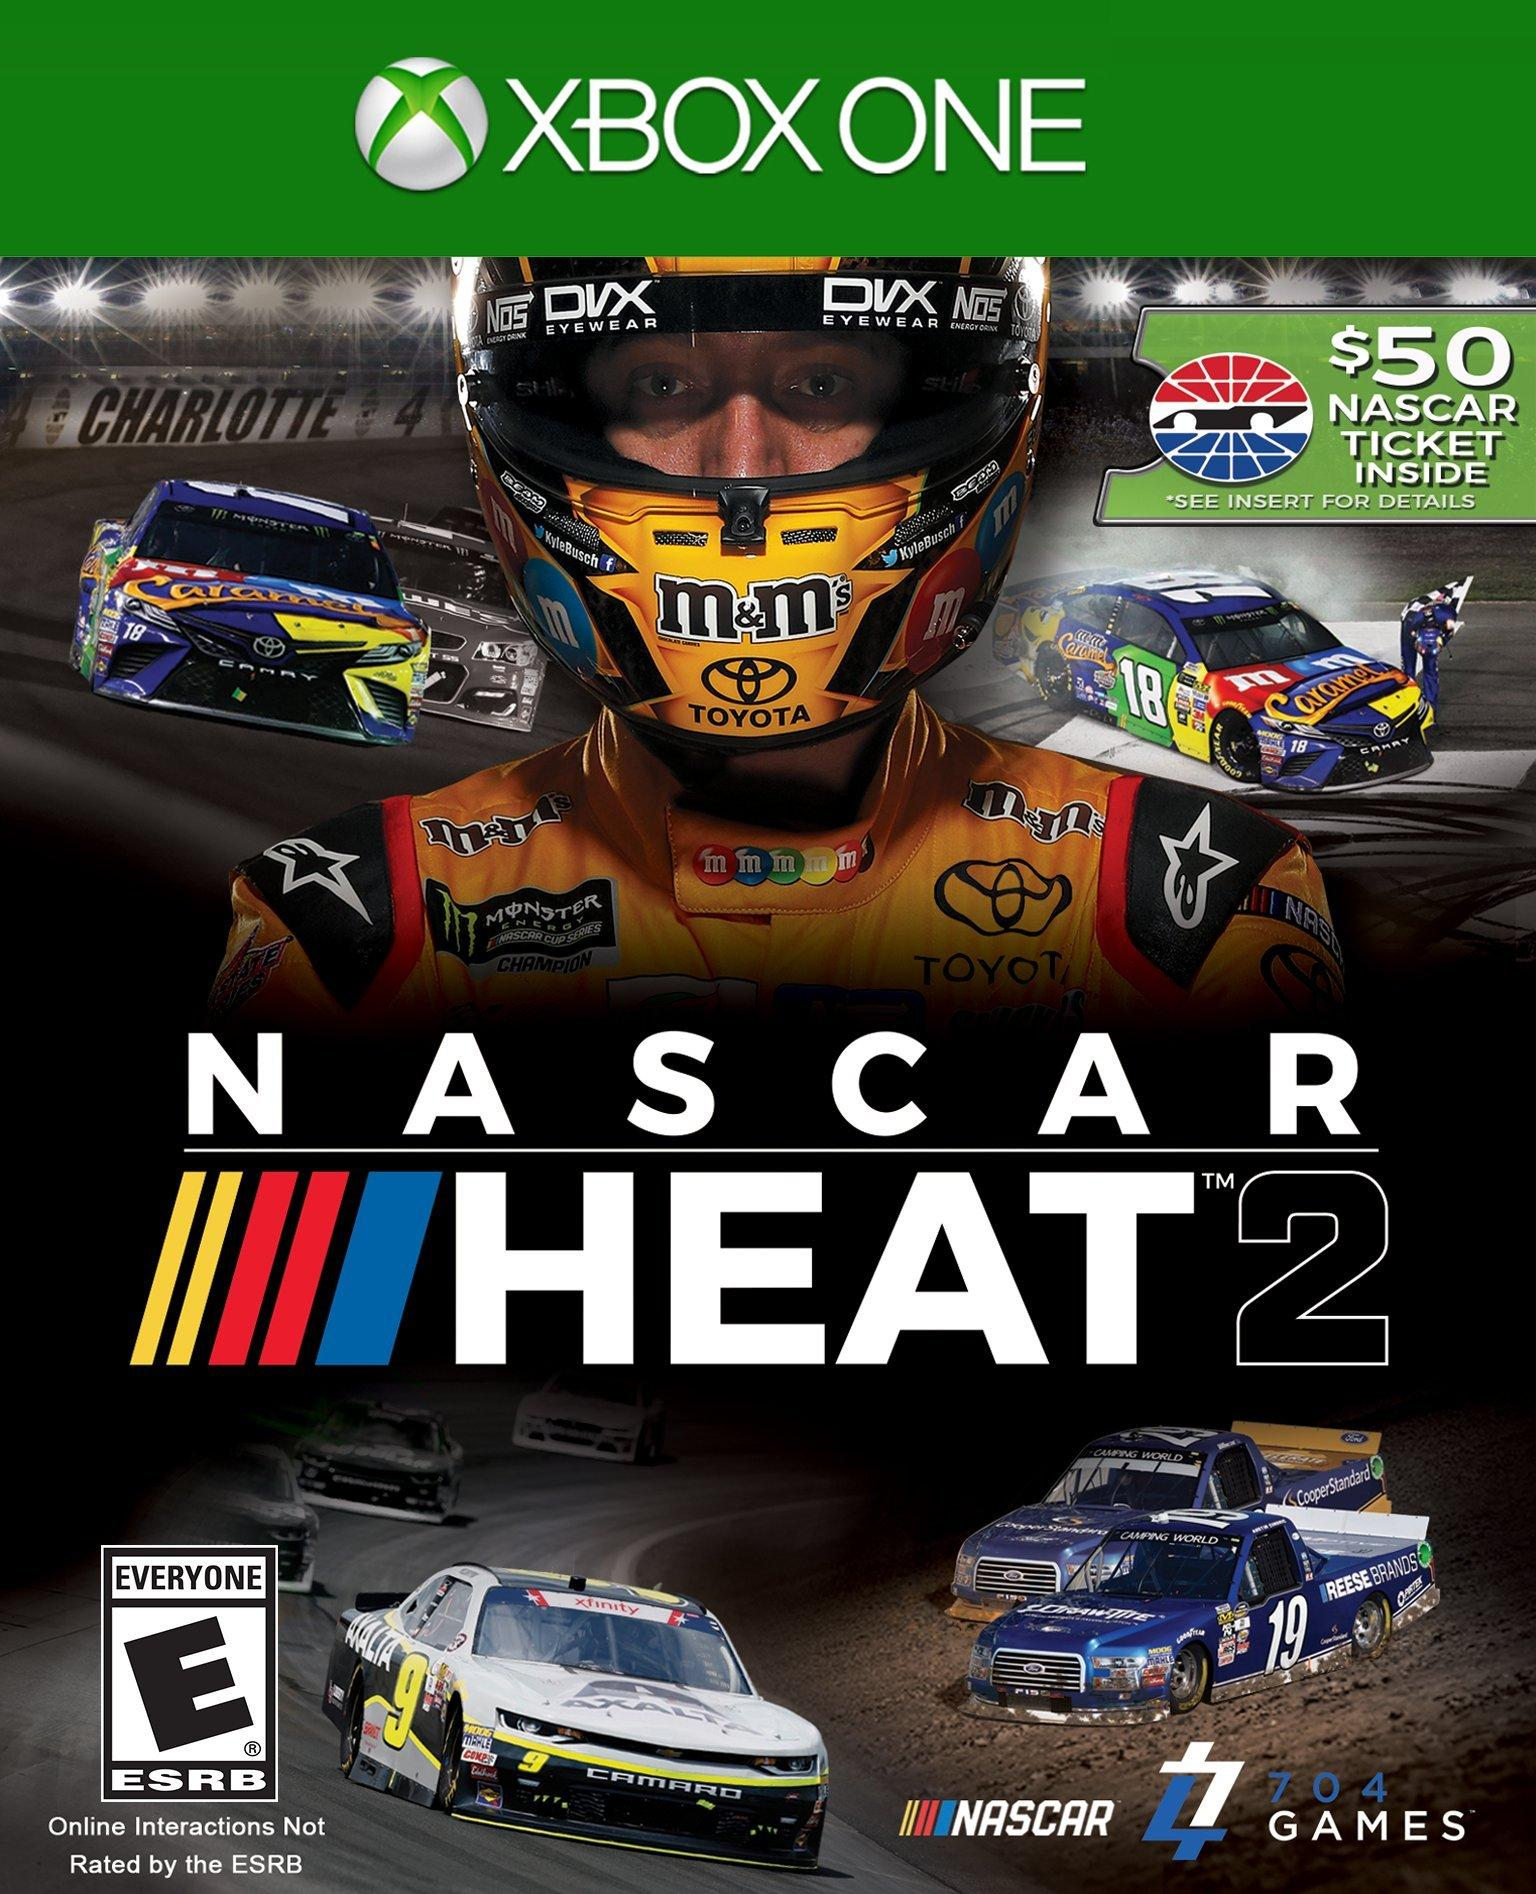 Nascar Racing Games >> Nascar Heat 2 Xbox One Gamestop